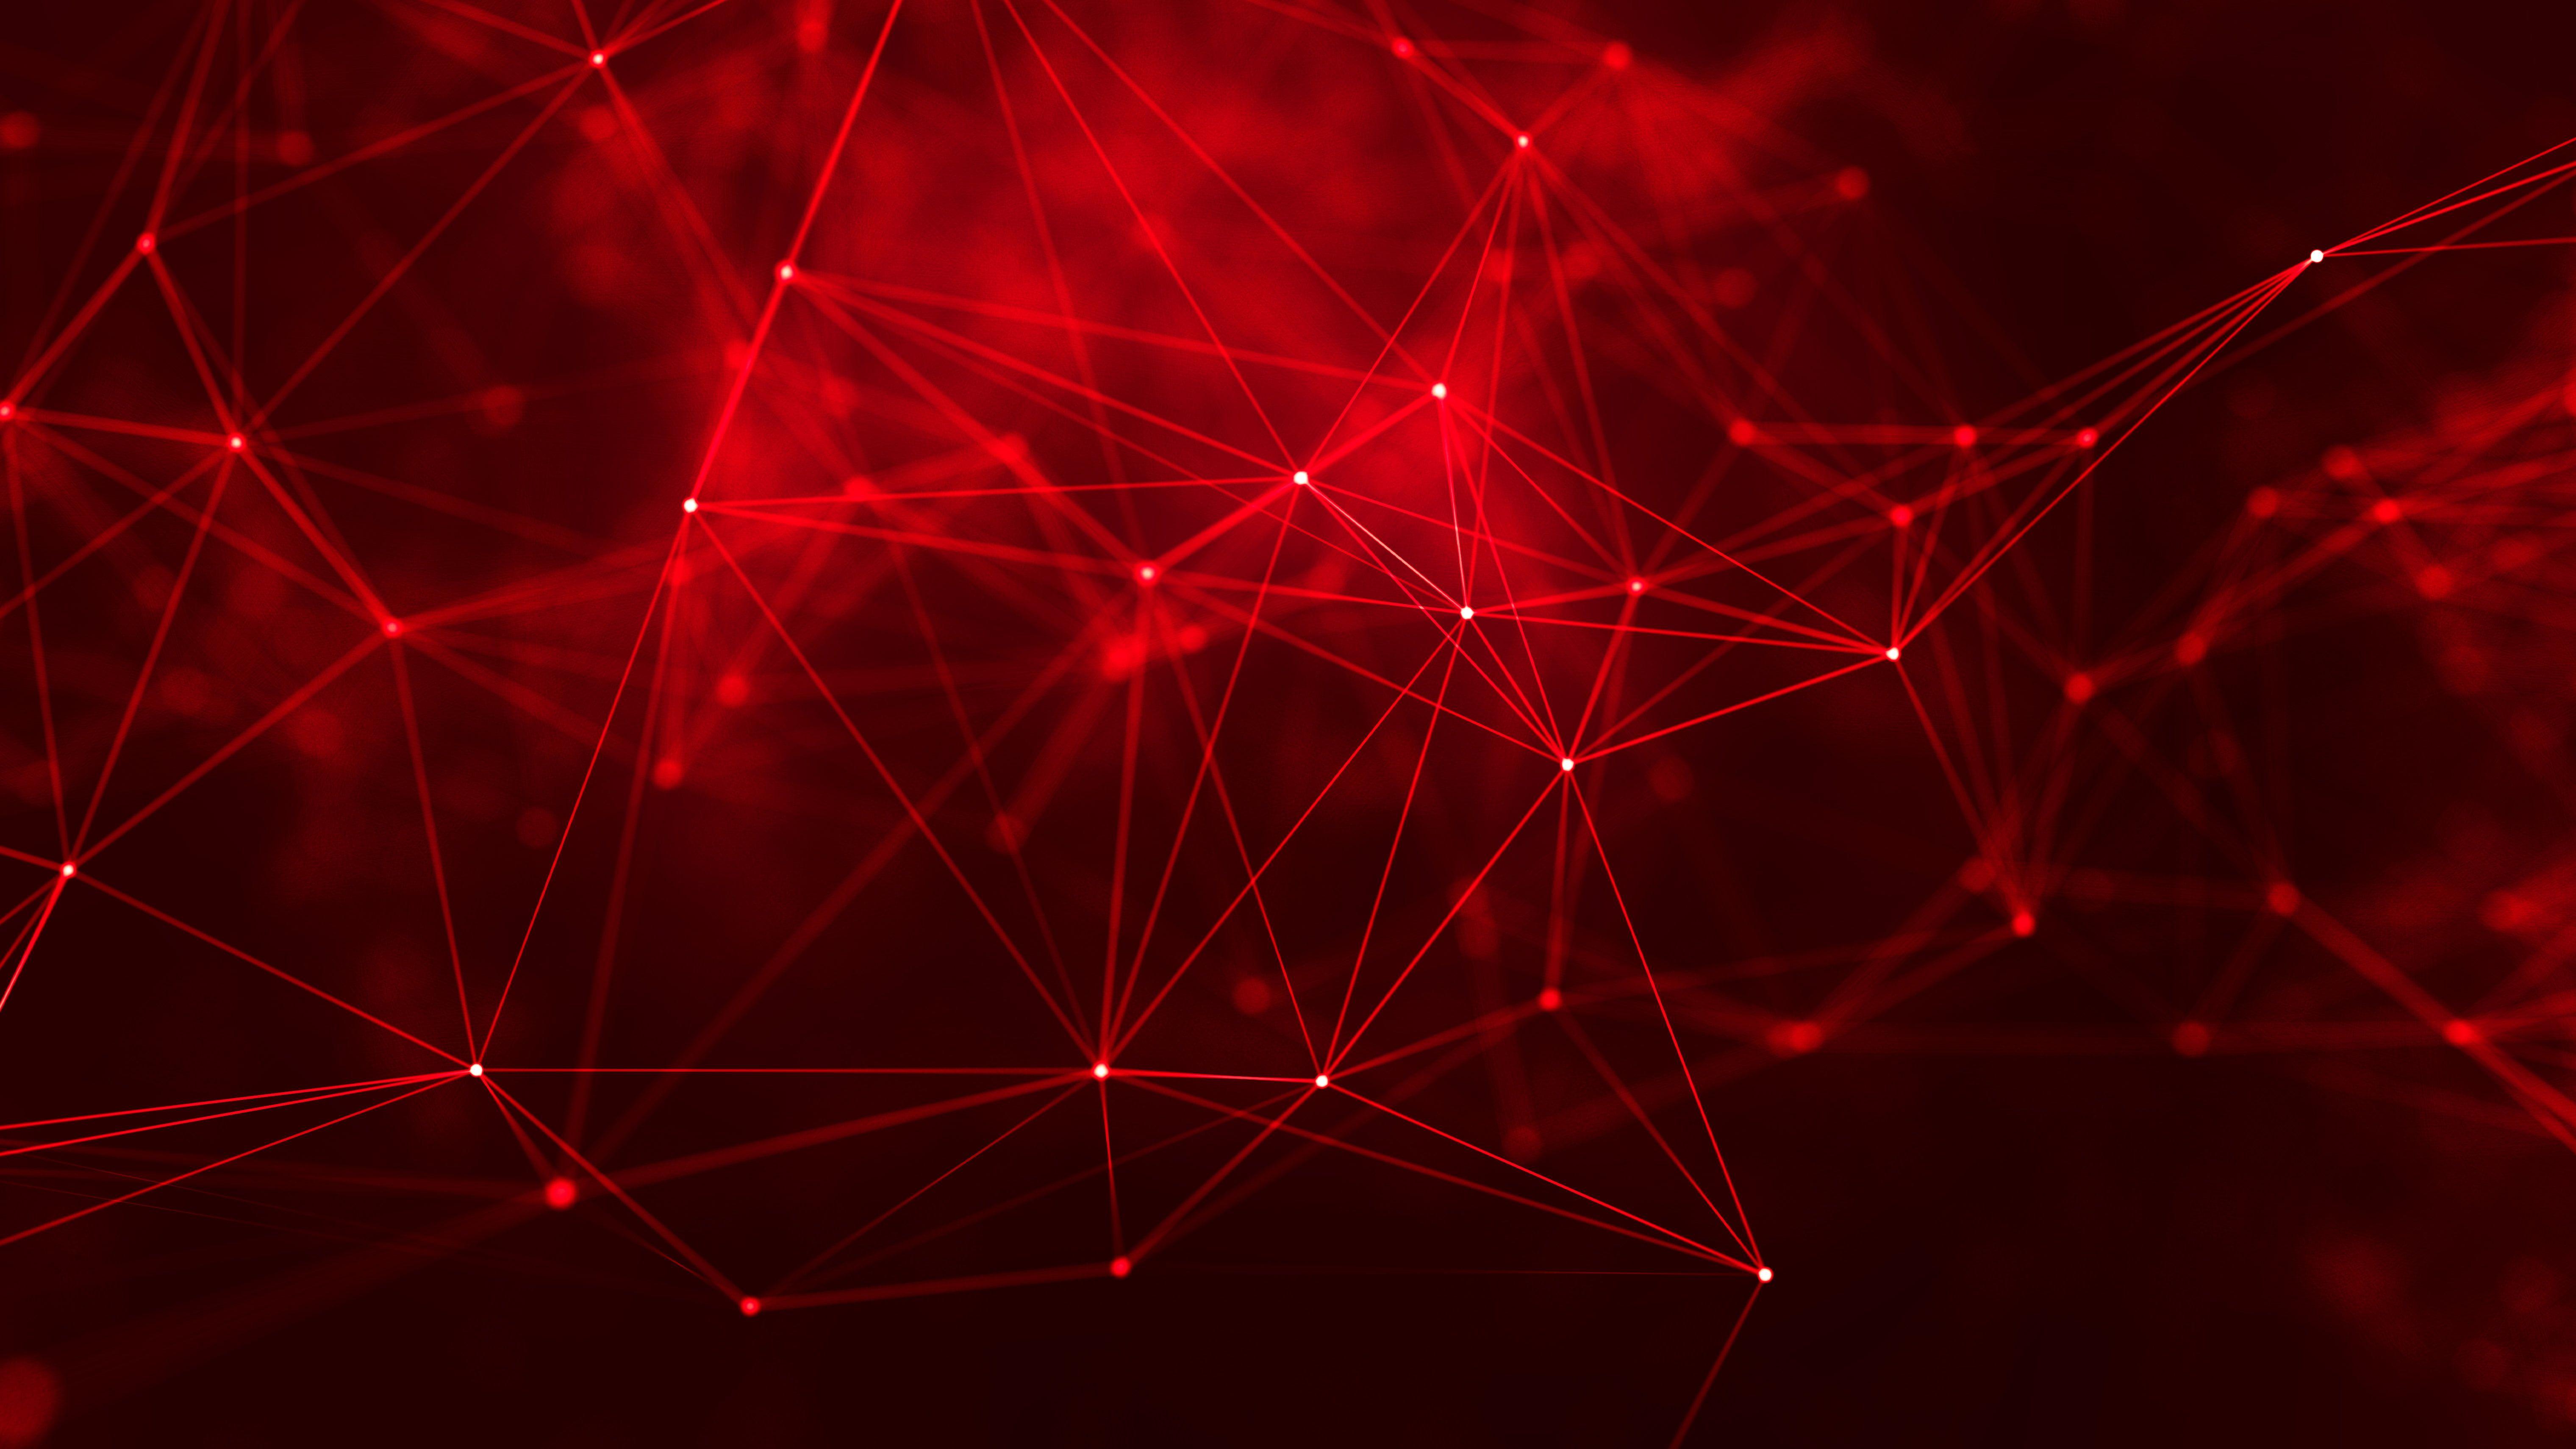 Geometry Cyberspace Digital Art Red Lines Abstract 5k Wallpaper Hdwallpaper Desktop In 2020 Creative Art Abstract Red Background